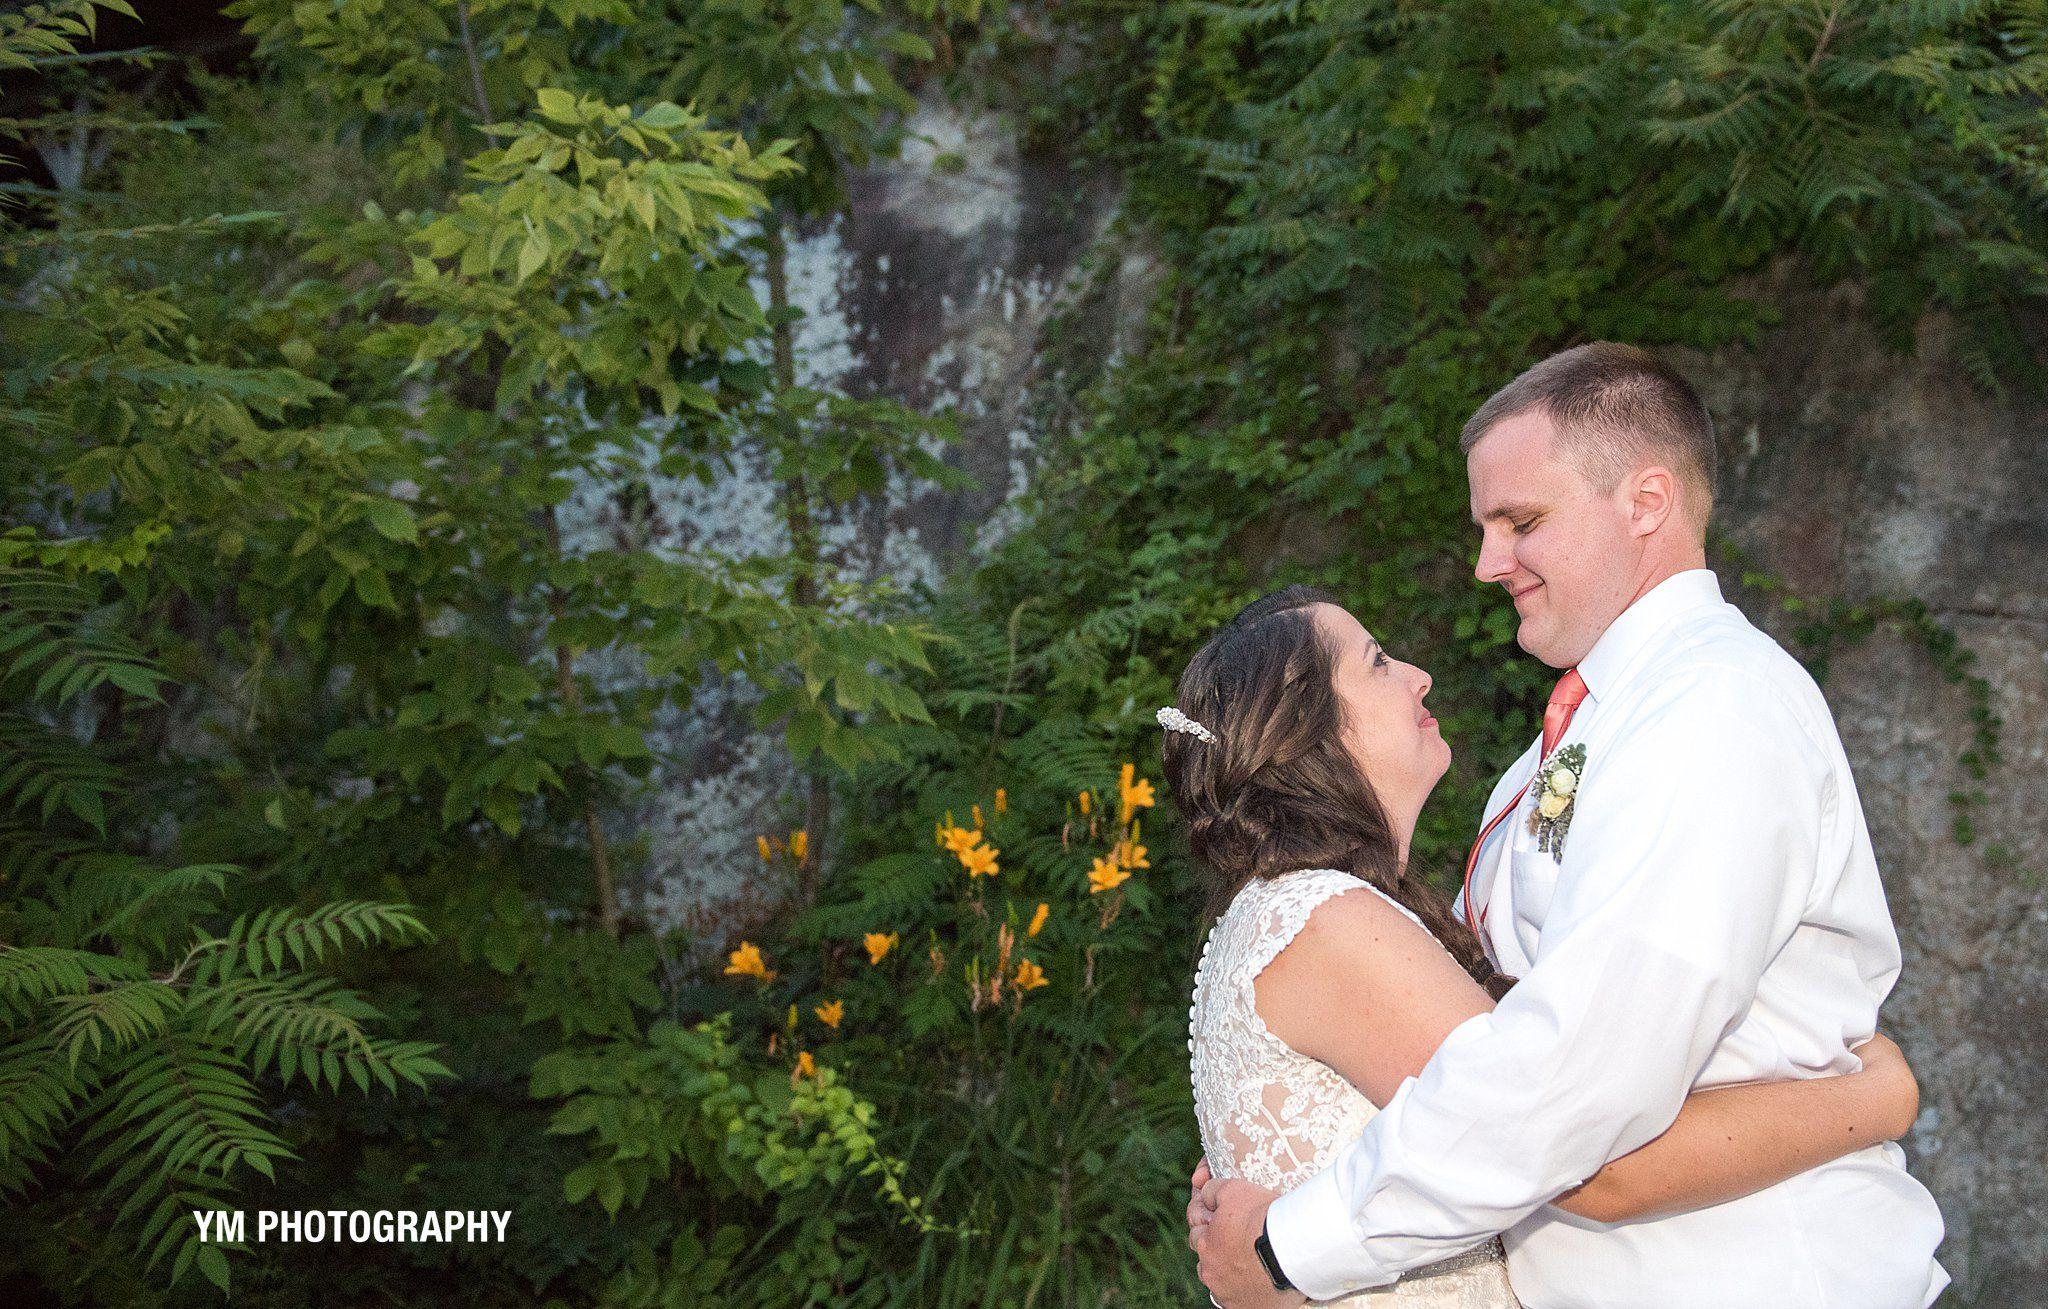 Drew & Stephanie | Blue Water Manor | Lake George Wedding Photographer  http://www.ymphotography.com/blog/2017/9/11/drew-stephanie-blue-water-manor-lake-george-wedding-photographer